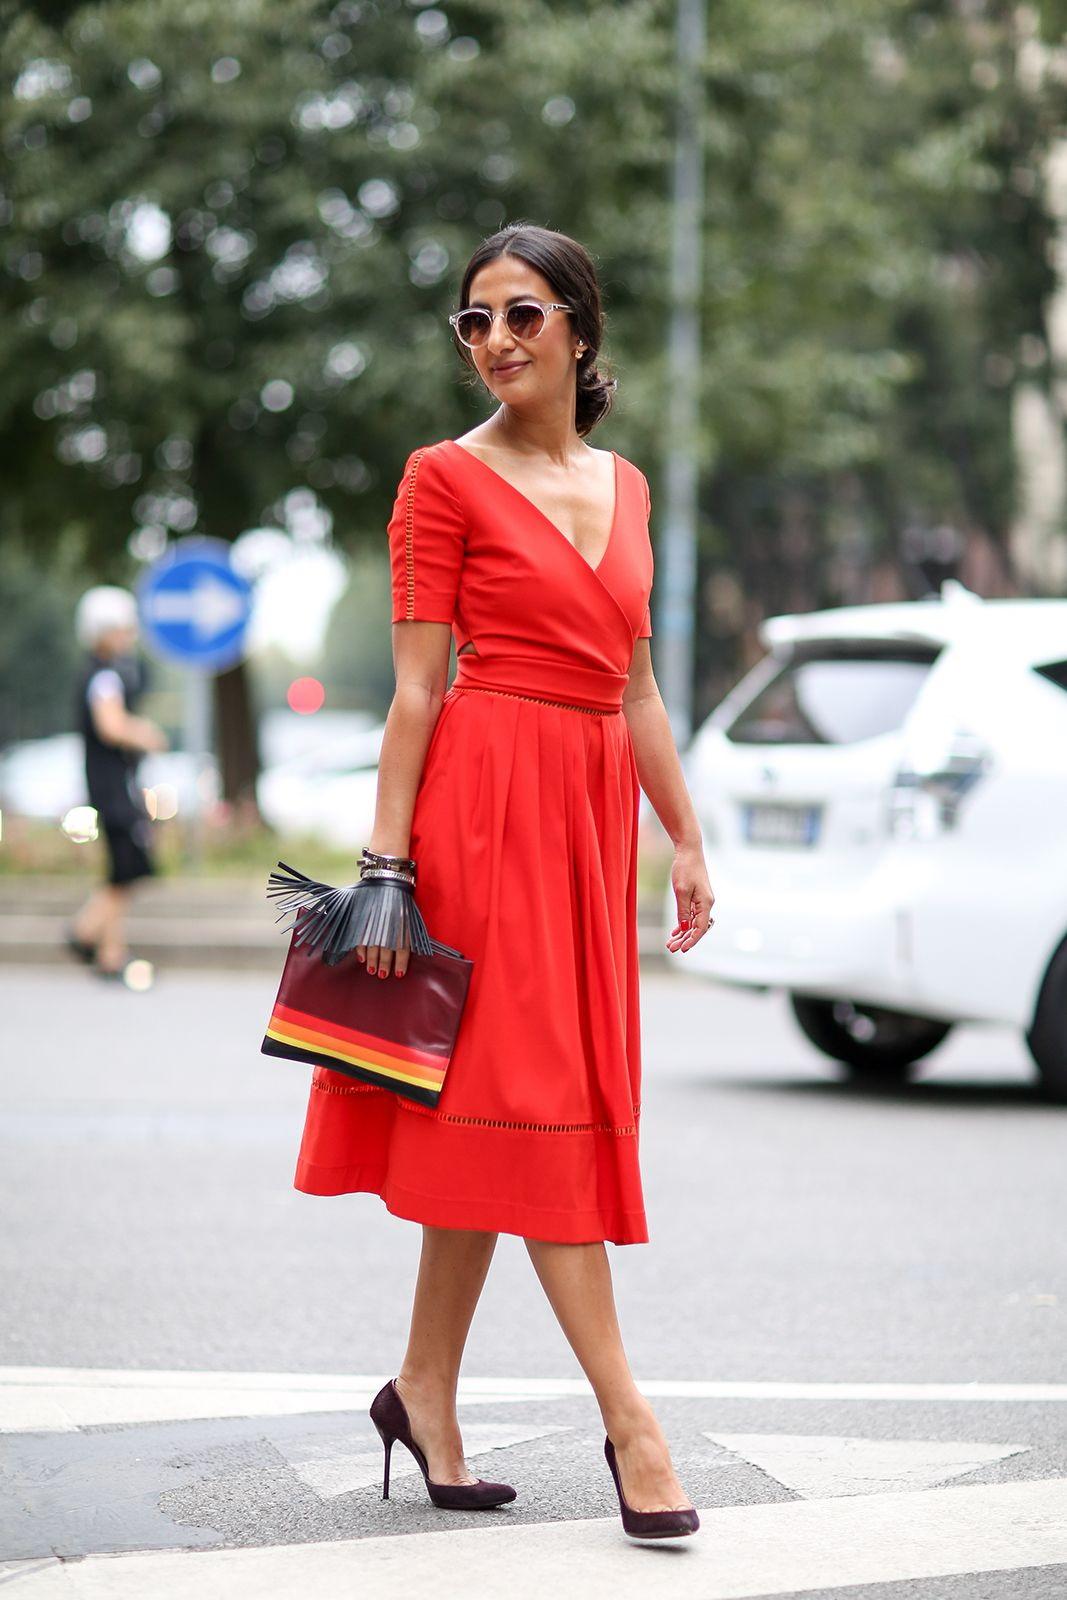 Milan Street Style Italian Chic Fashion 12 3fa99